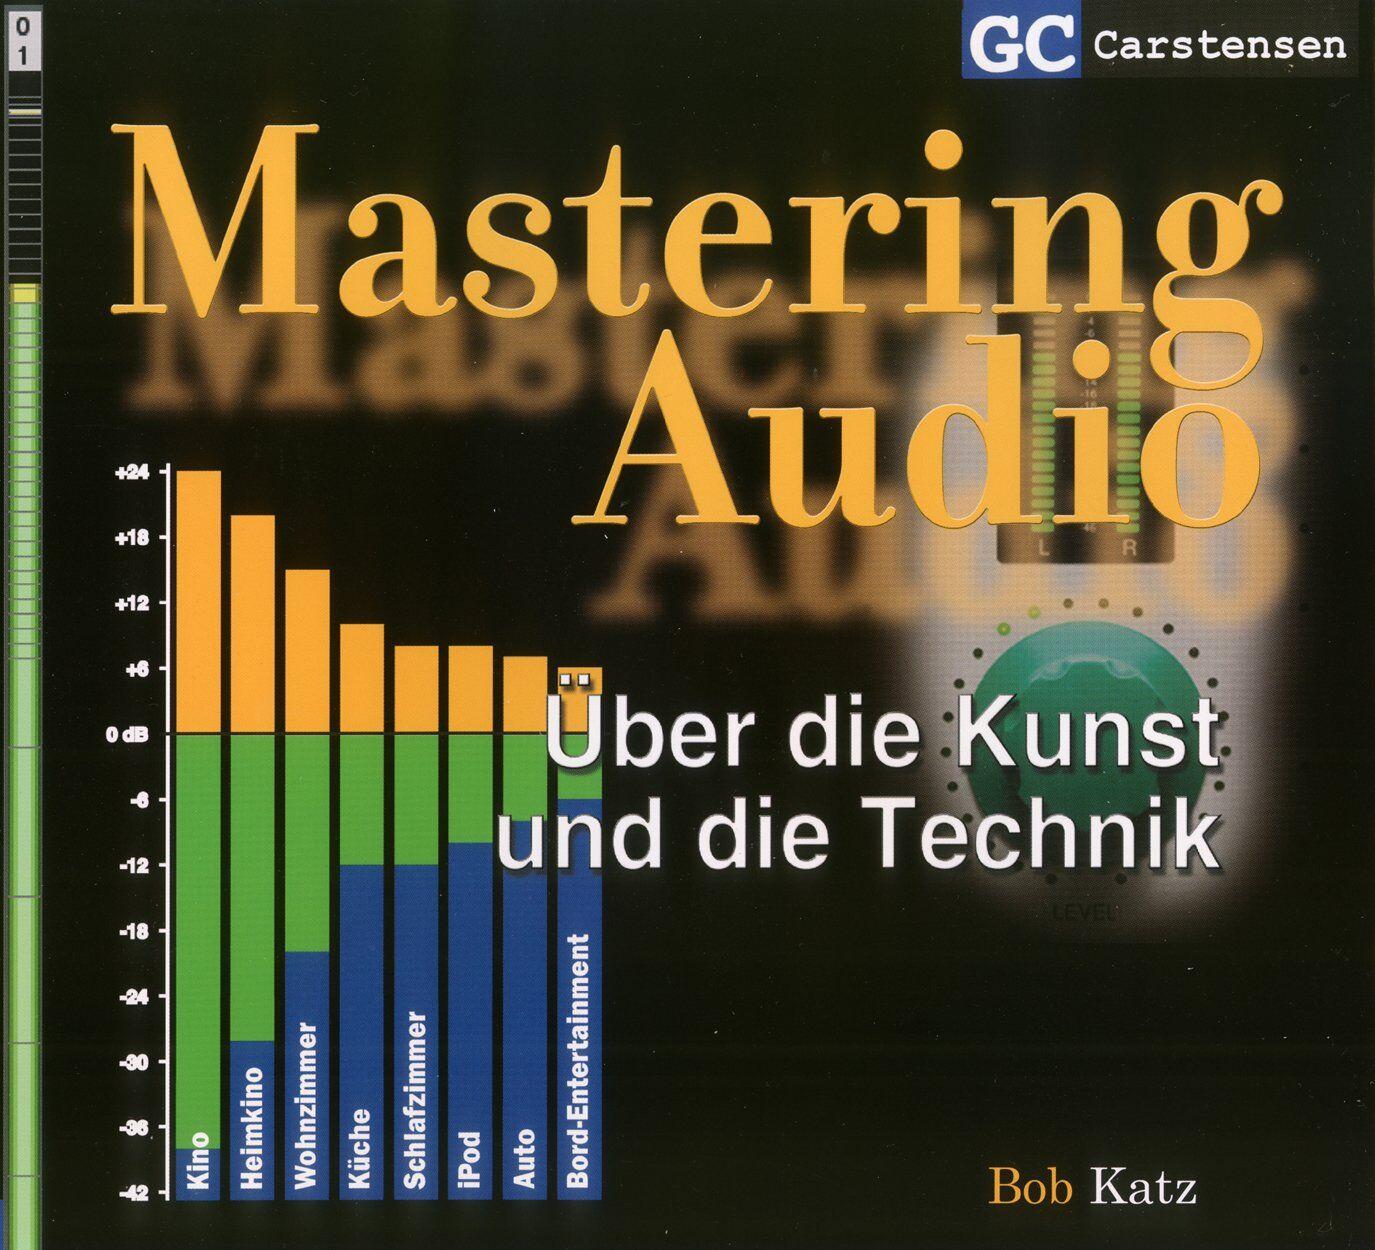 Mastering Audio von Bob Katz